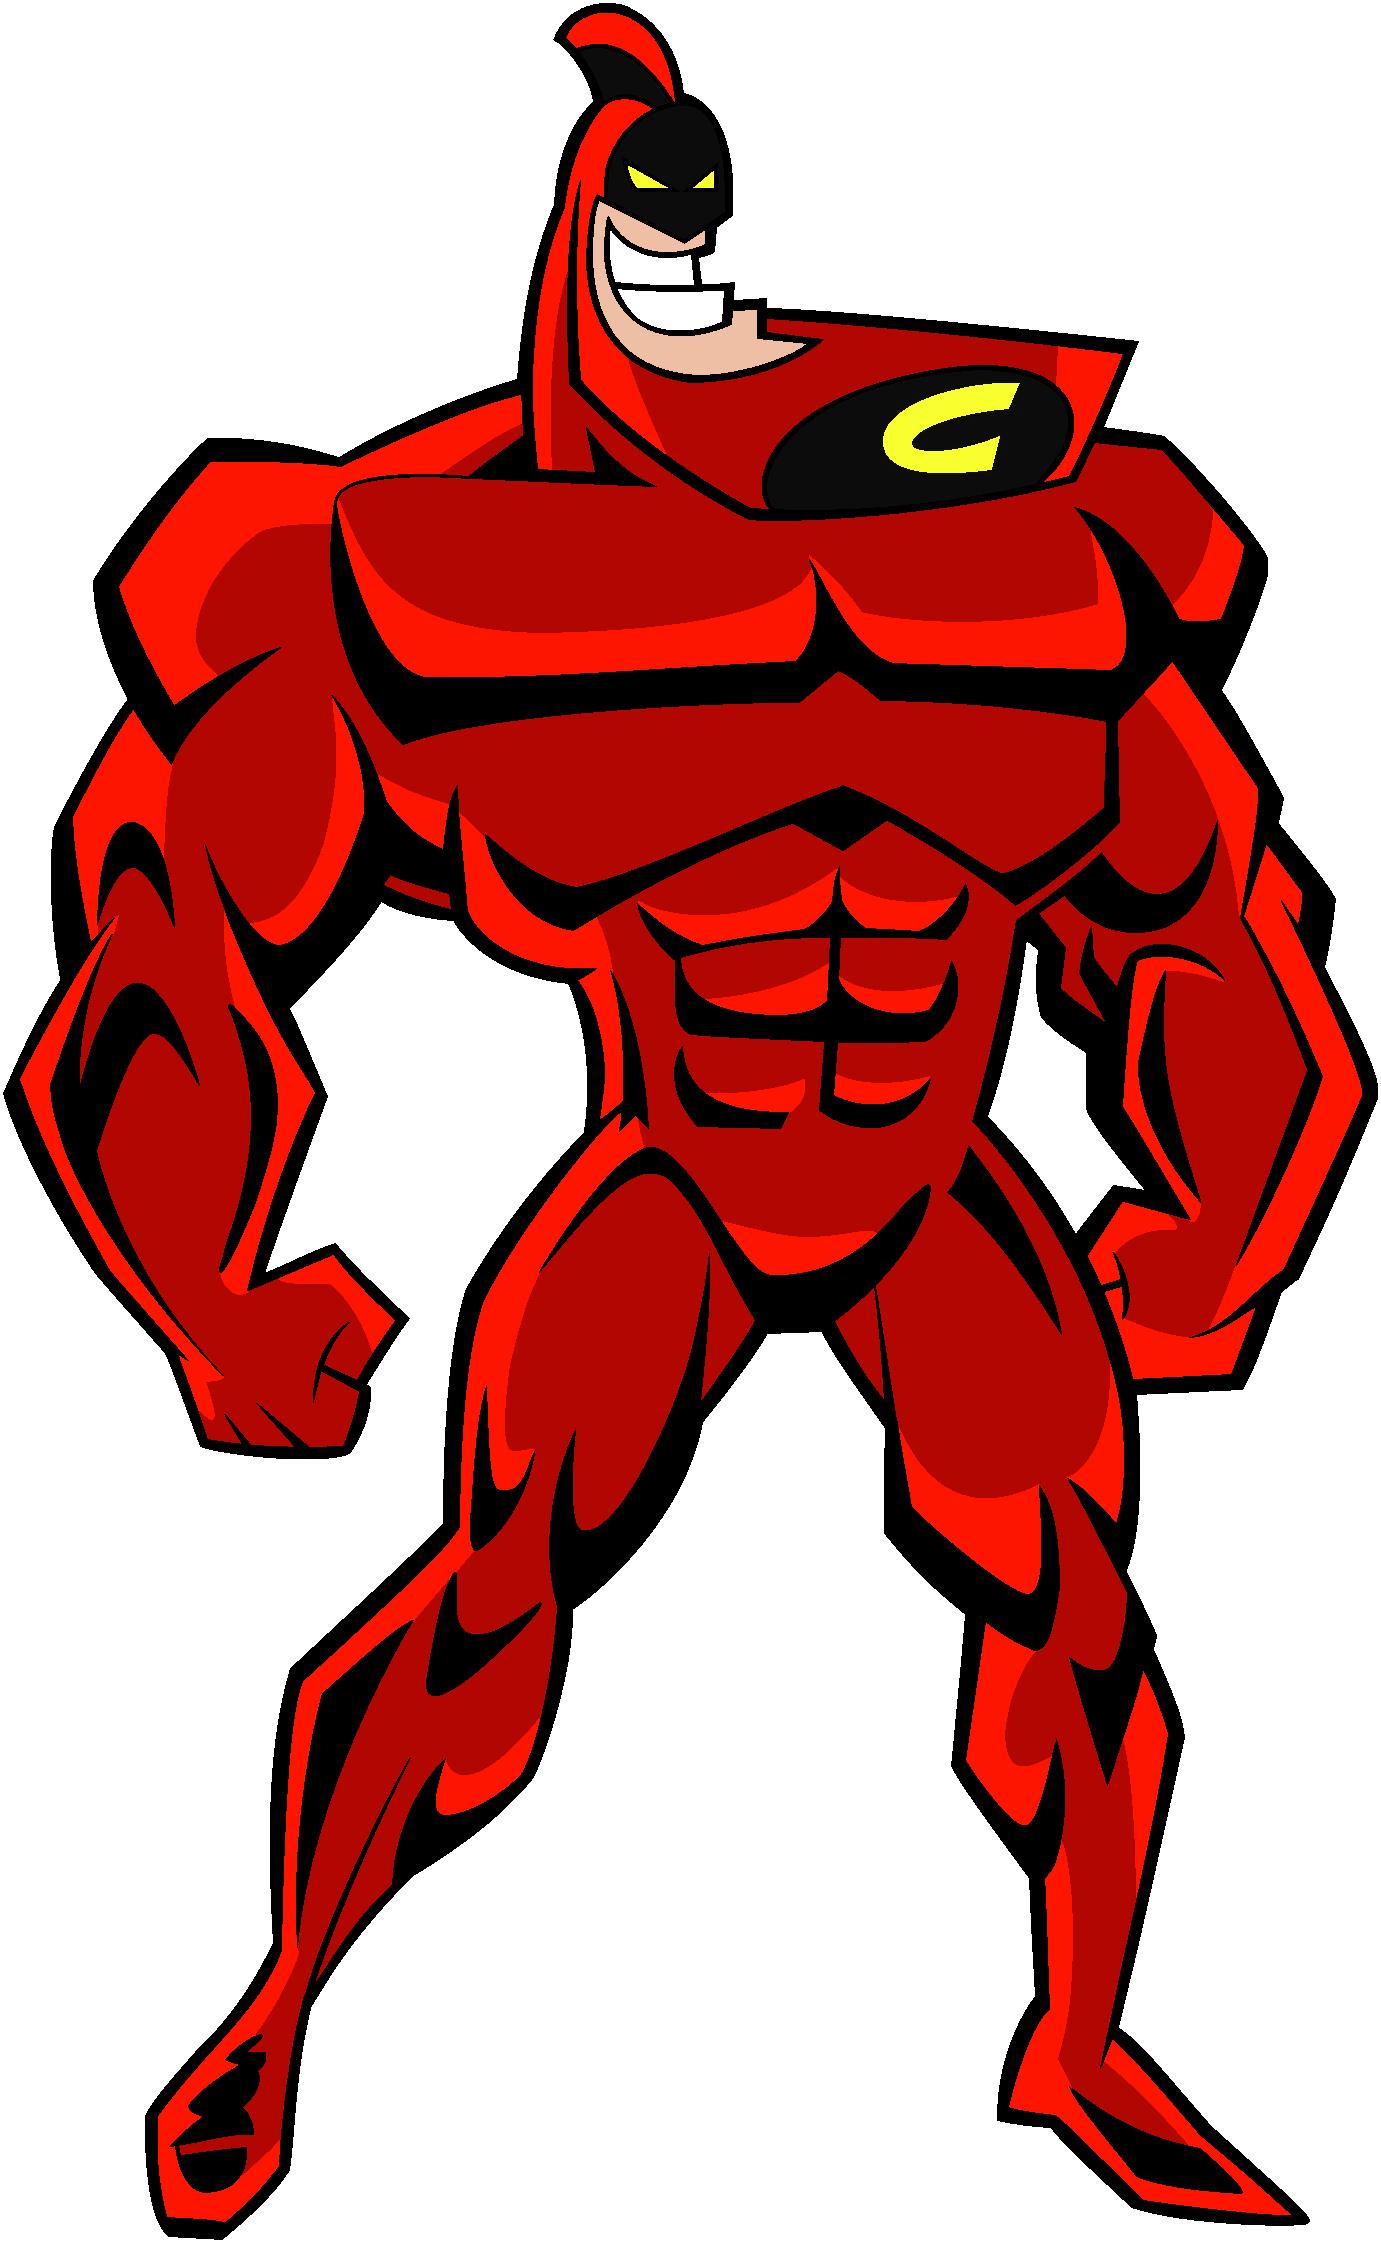 Crimson Chin (The All New Fairly OddParents!)/Info